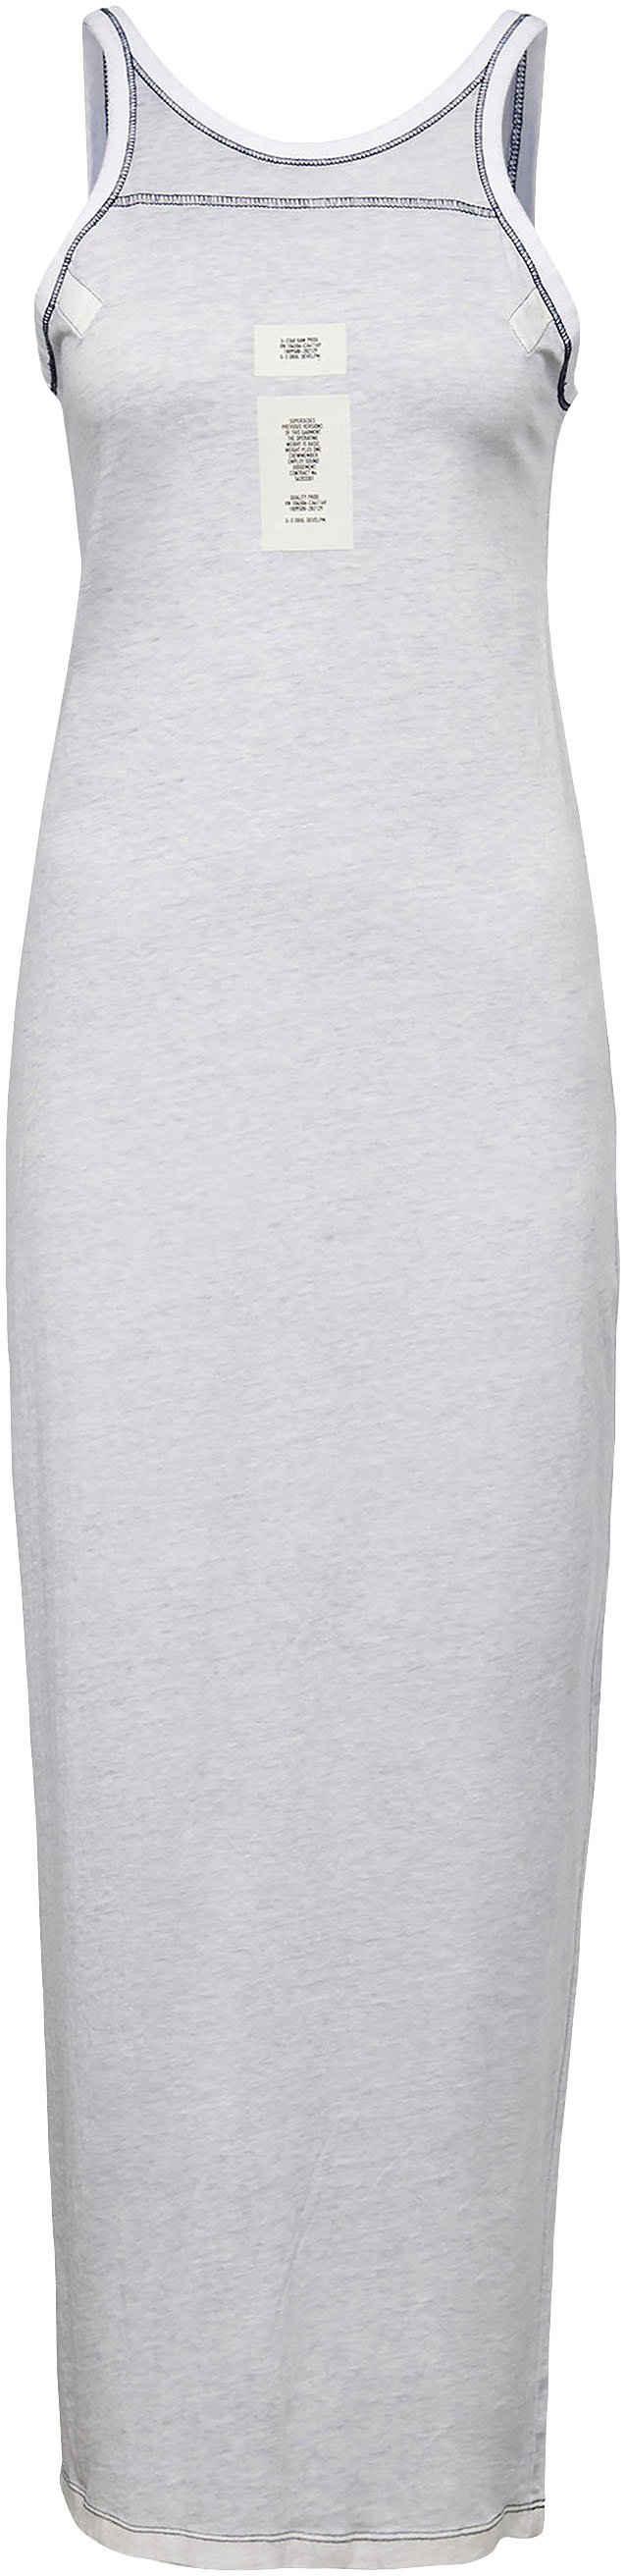 G-Star RAW Shirtkleid »Maxi tank top dress« Tanktop Kleid mit Frontdruck